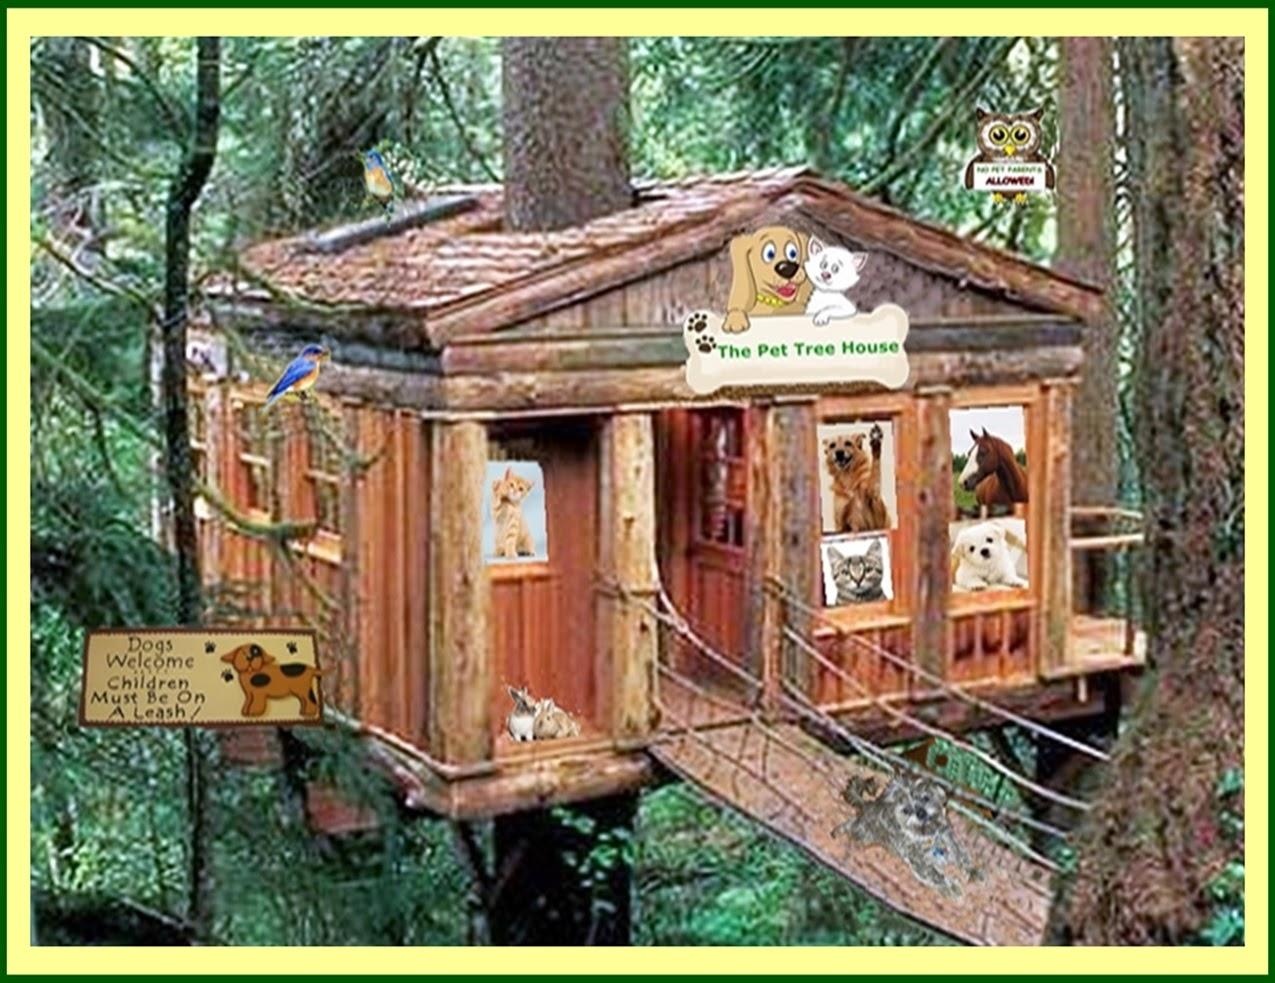 The Pet Tree House